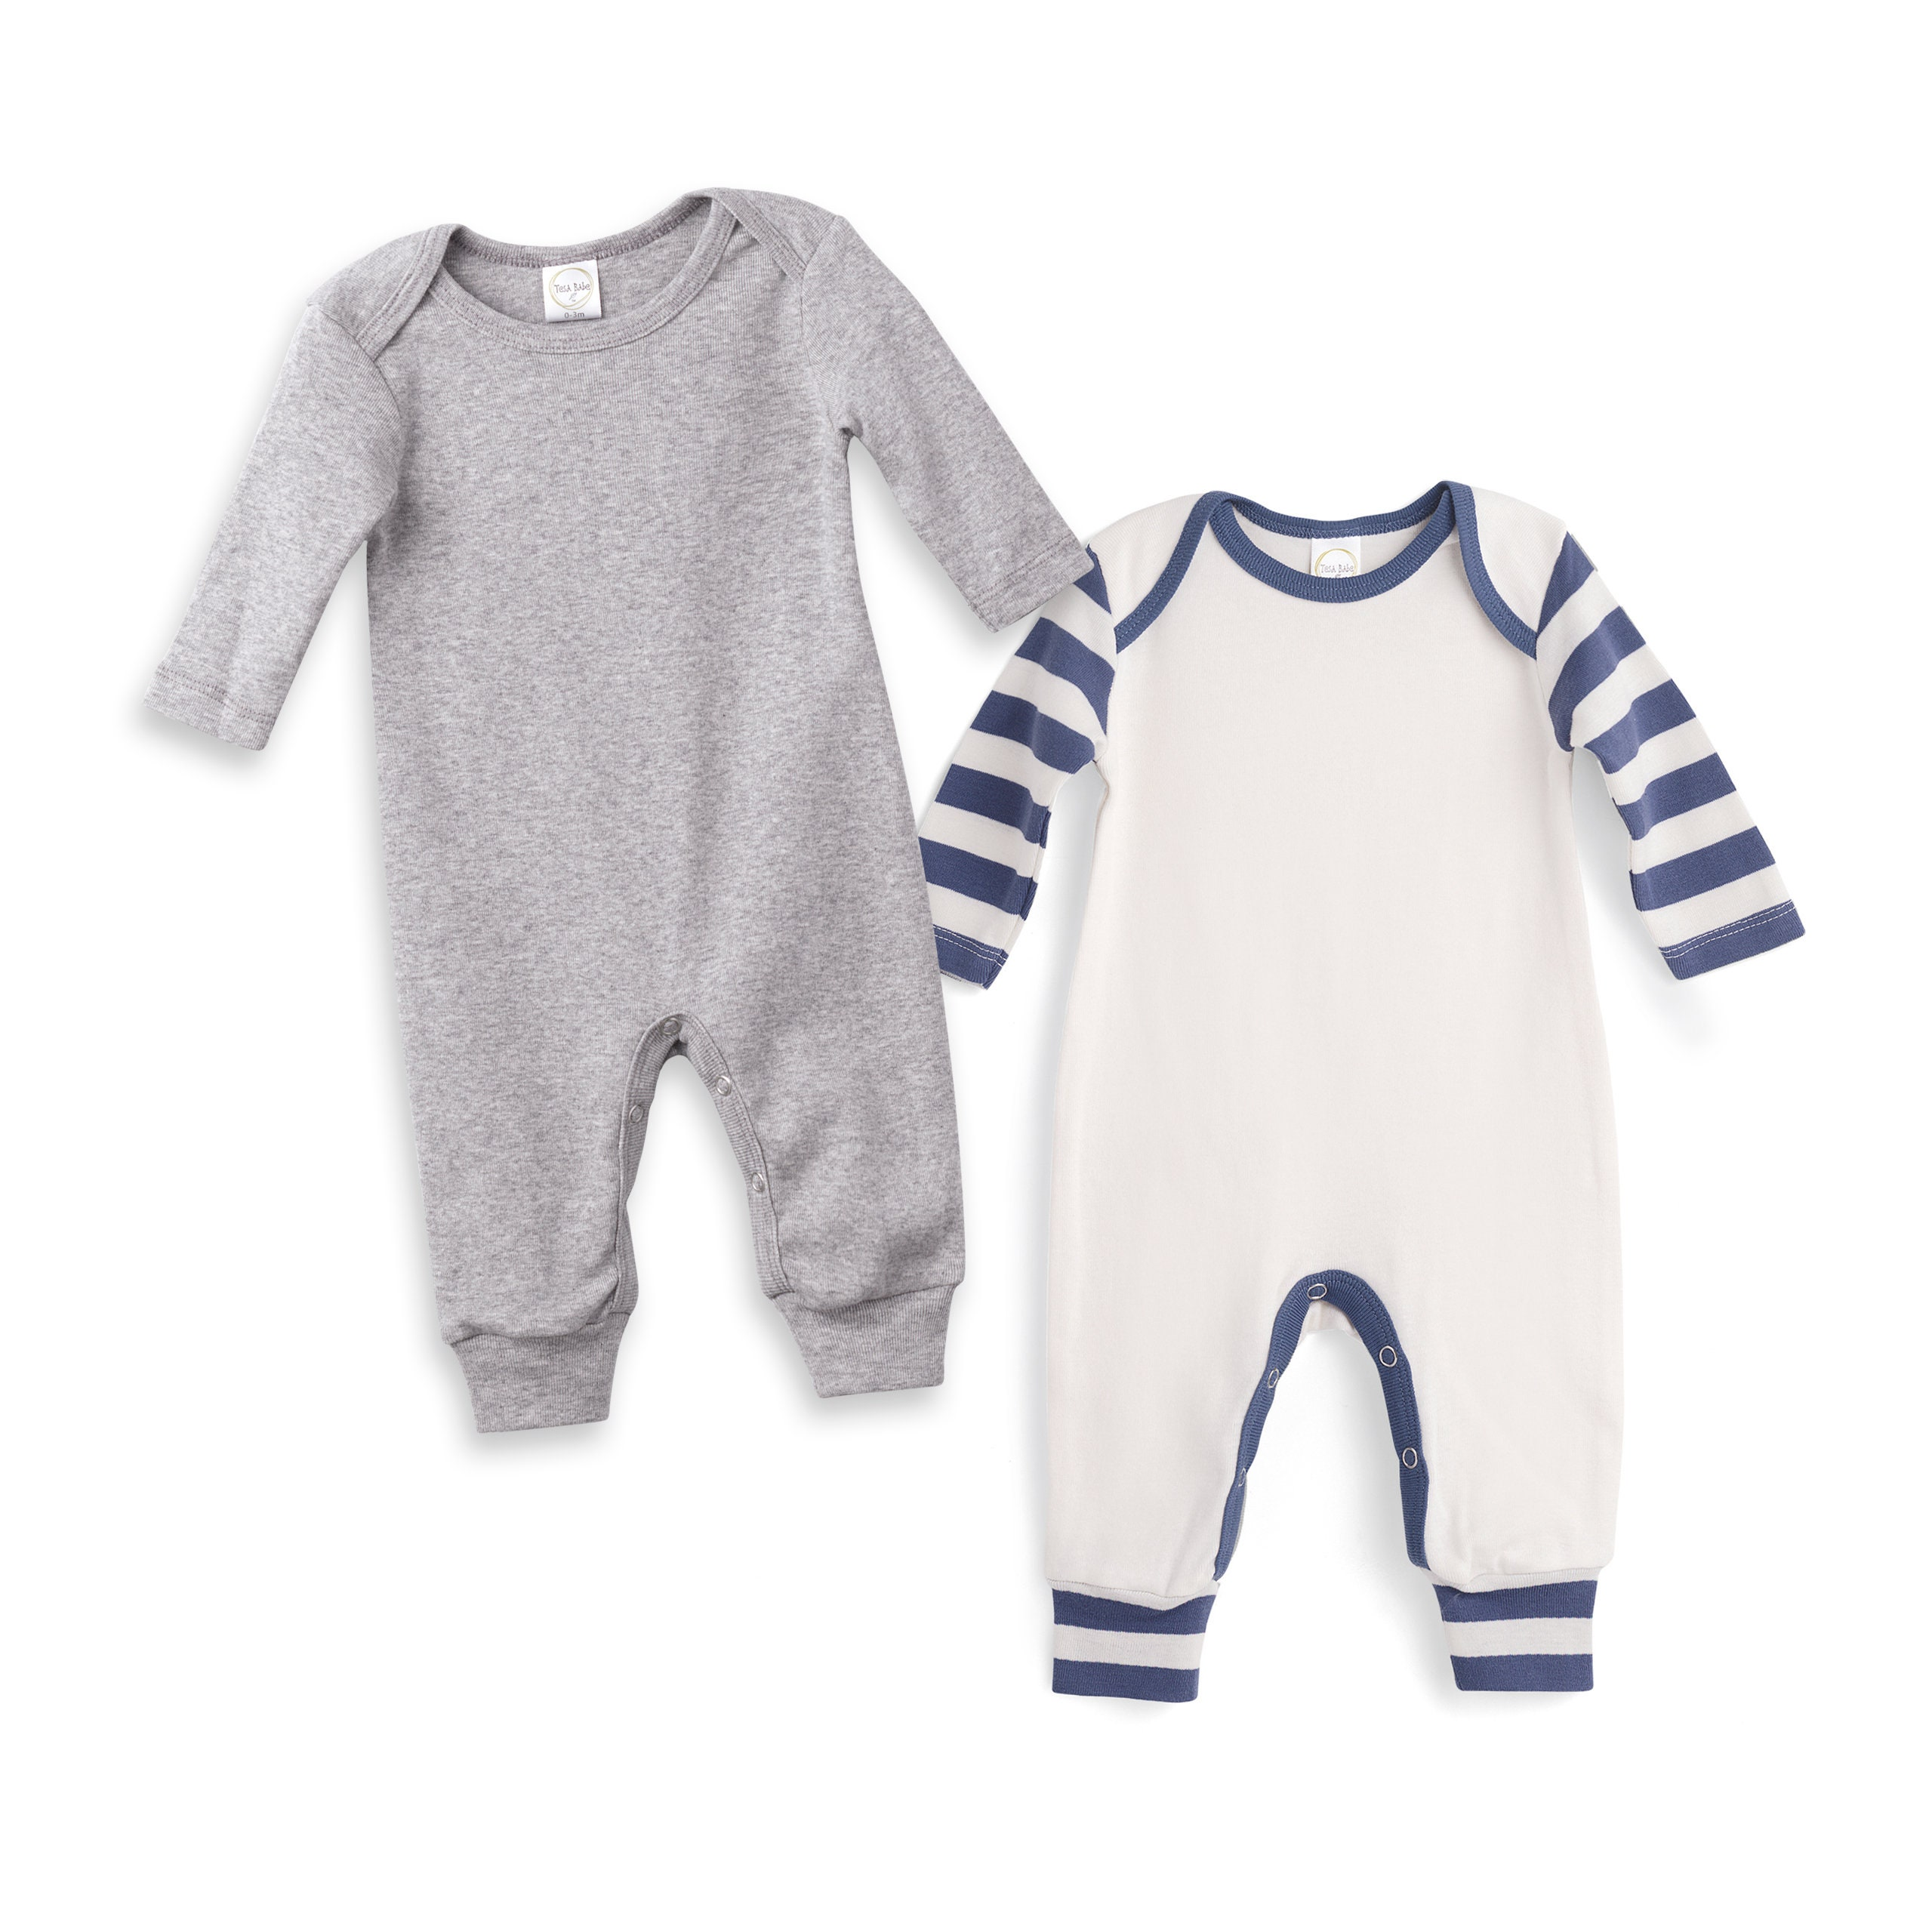 0cce1e21e245 Newborn Romper Grey and Blue Striped